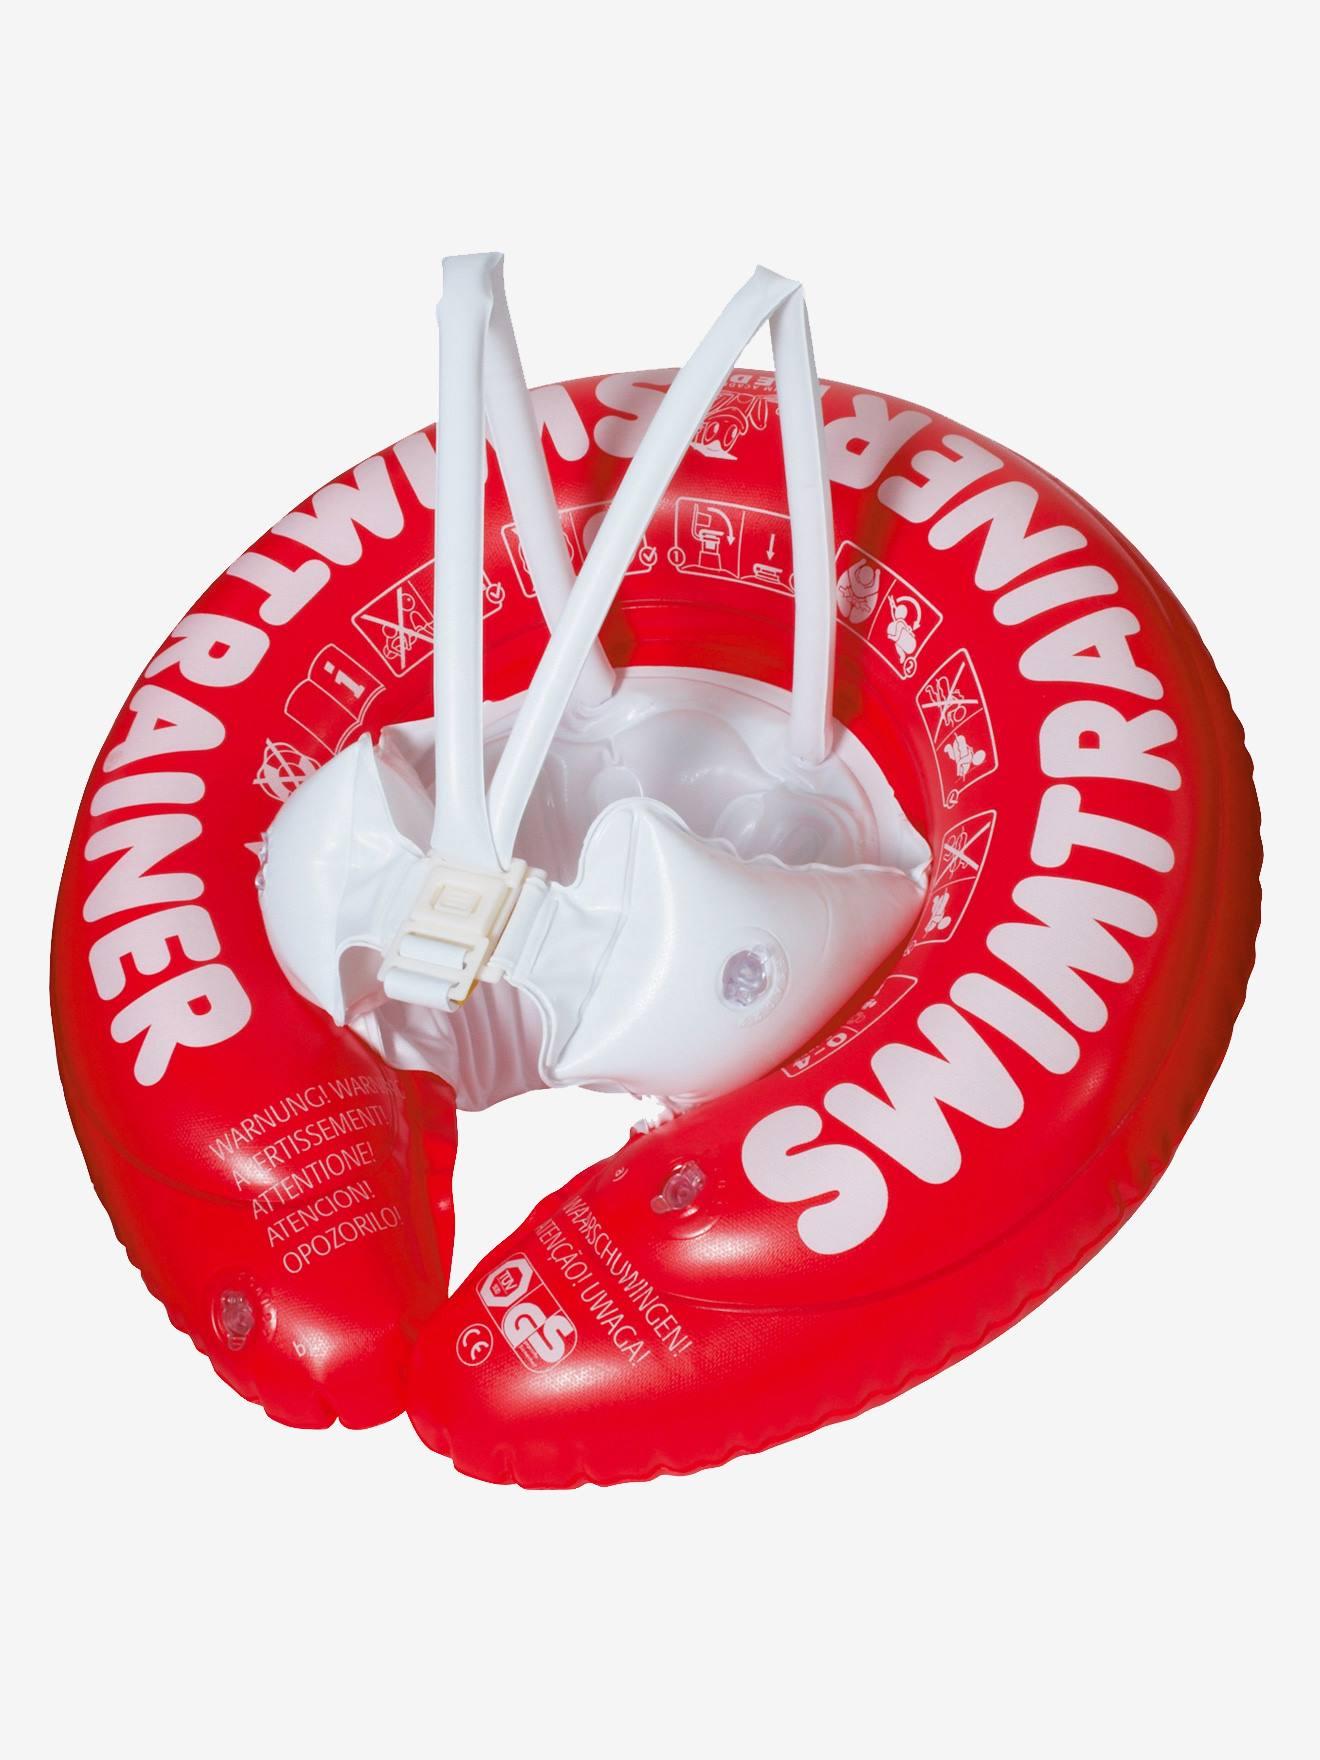 Bouée Swimtrainer FRED SWIM ACADEMY rouge 3 mois - 4 ans